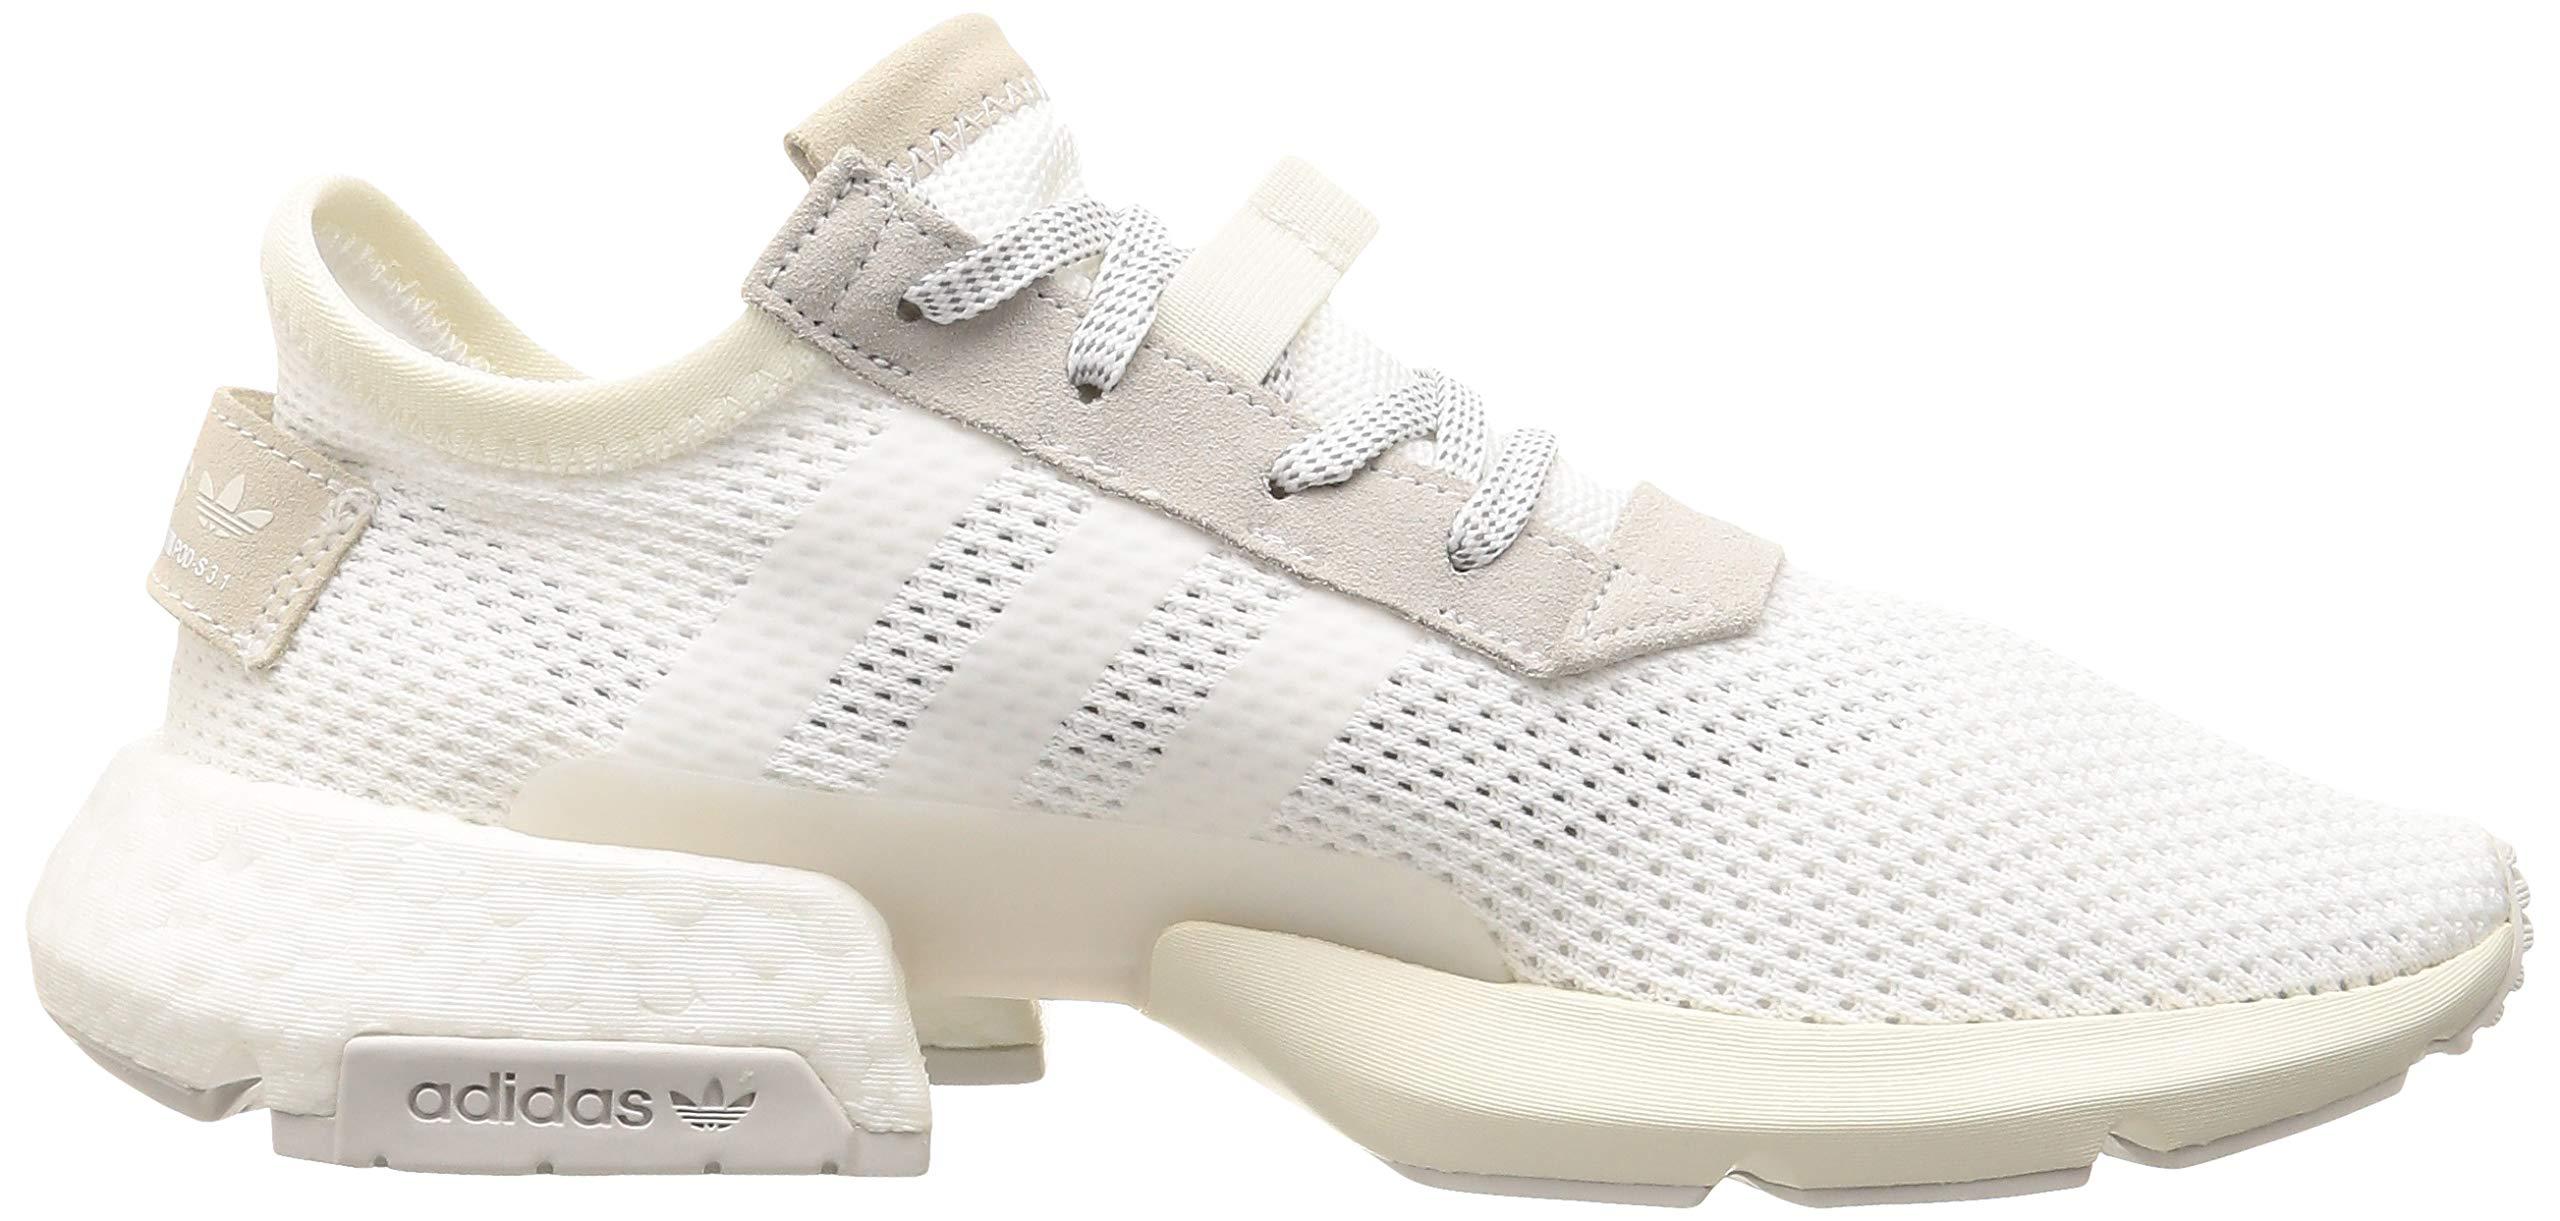 quality design 35c3a a722c Adidas Pod-s3.1 - Face Shop